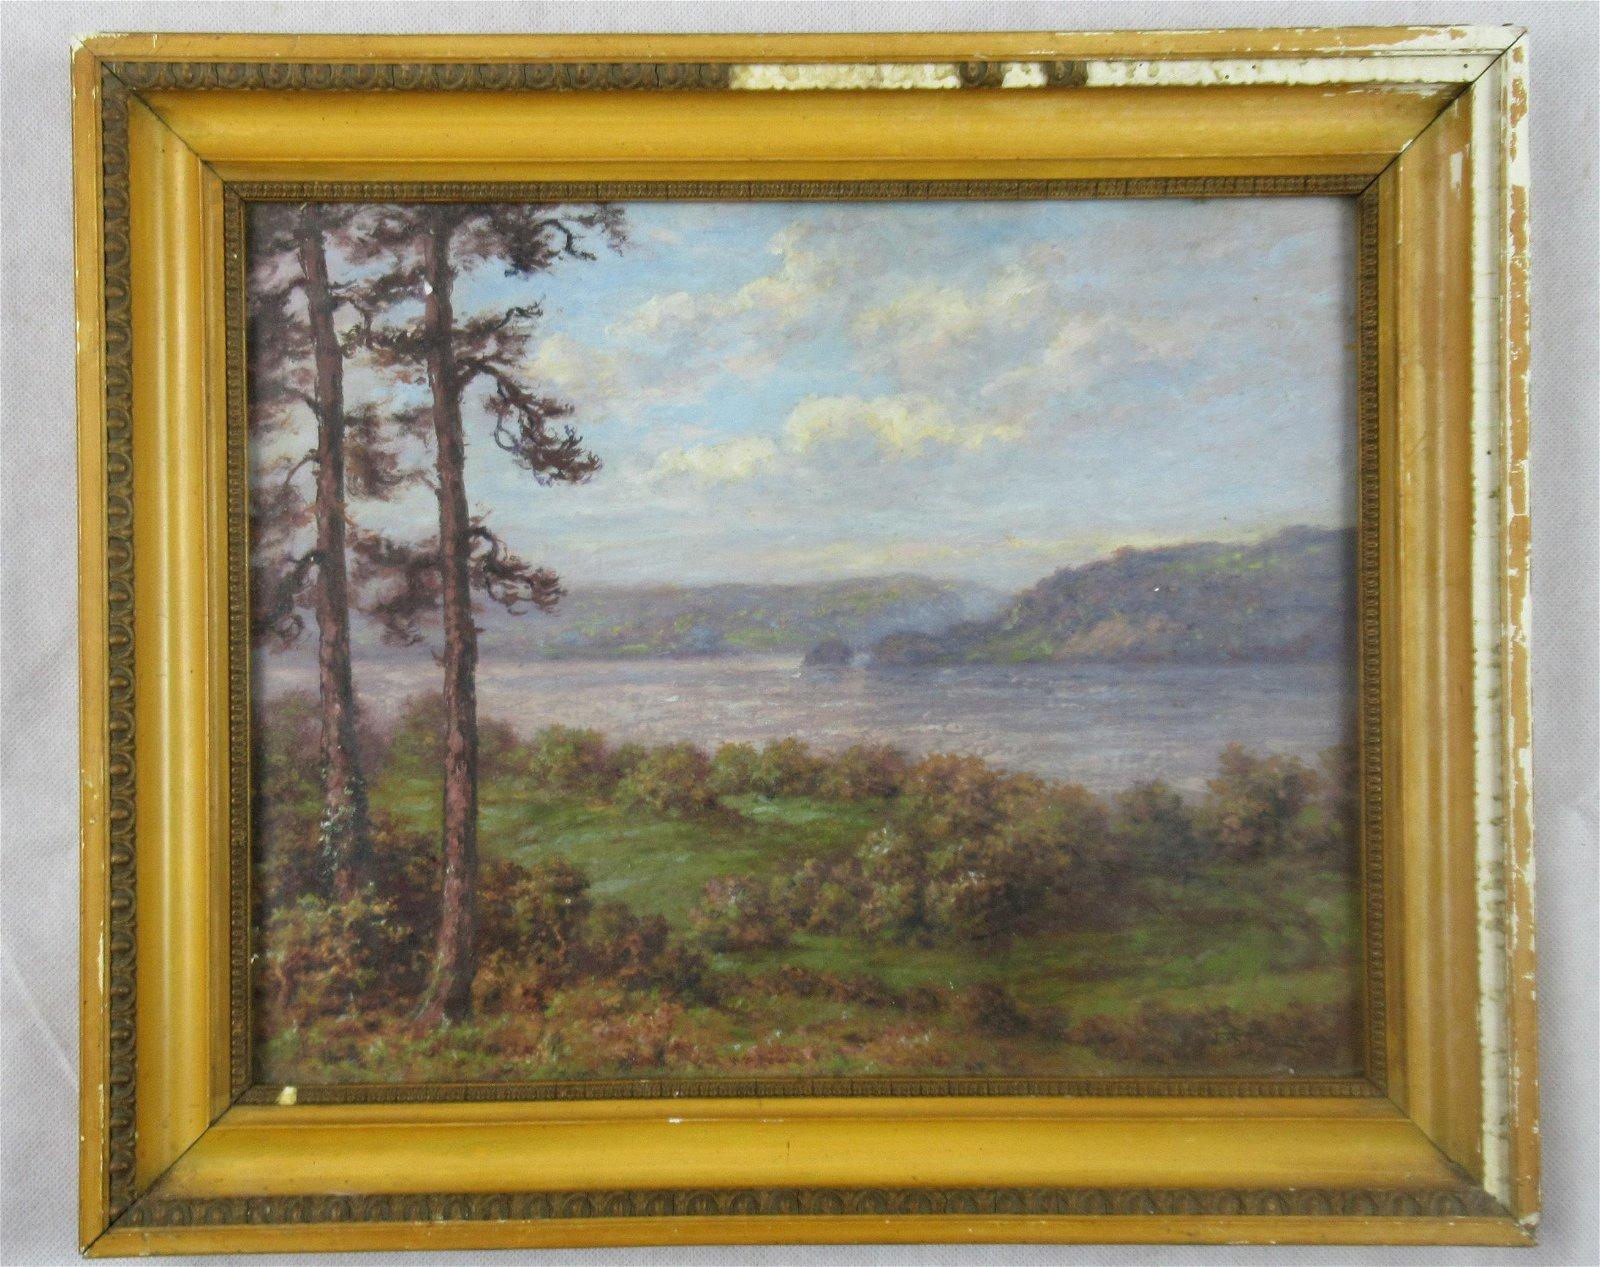 John T. Randolph oil painting